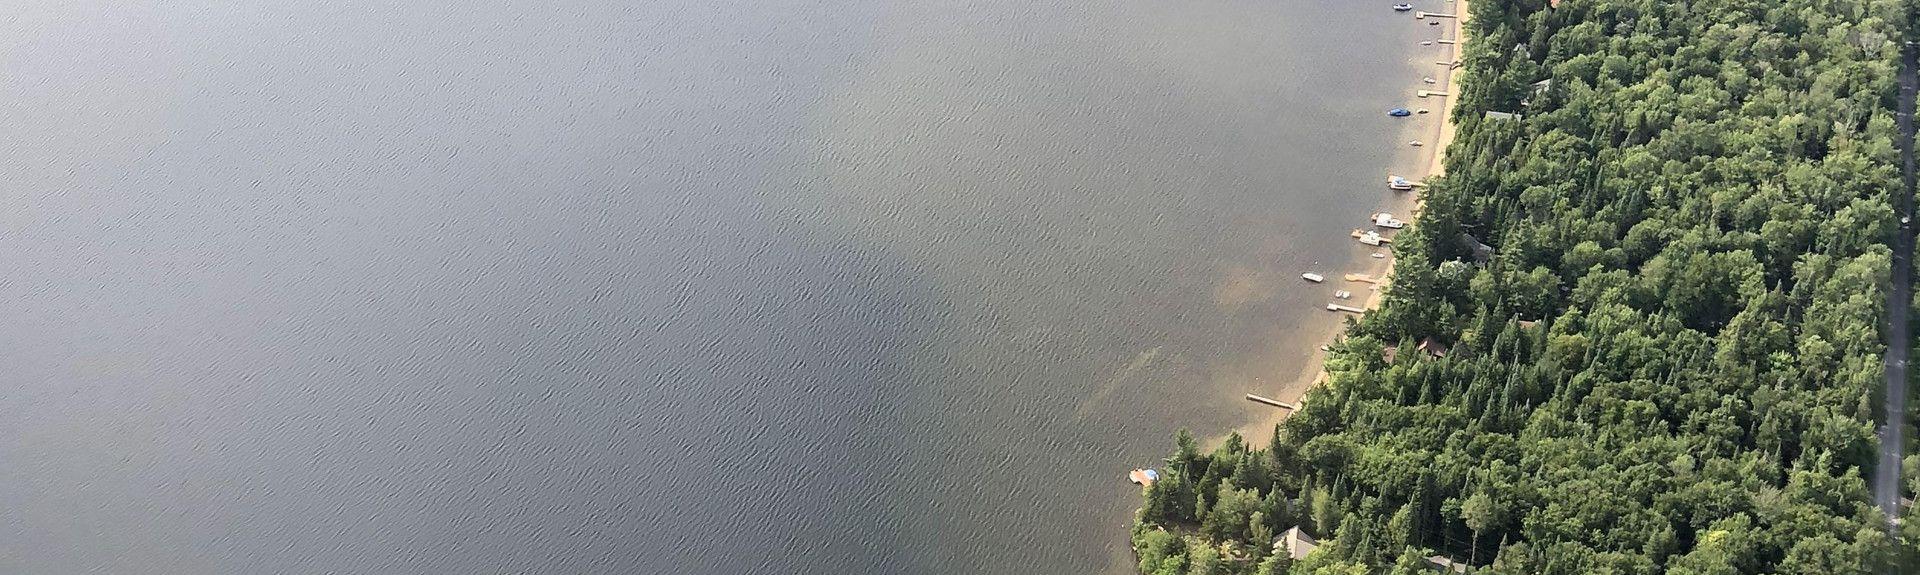 Fourth Lake, New York, United States of America